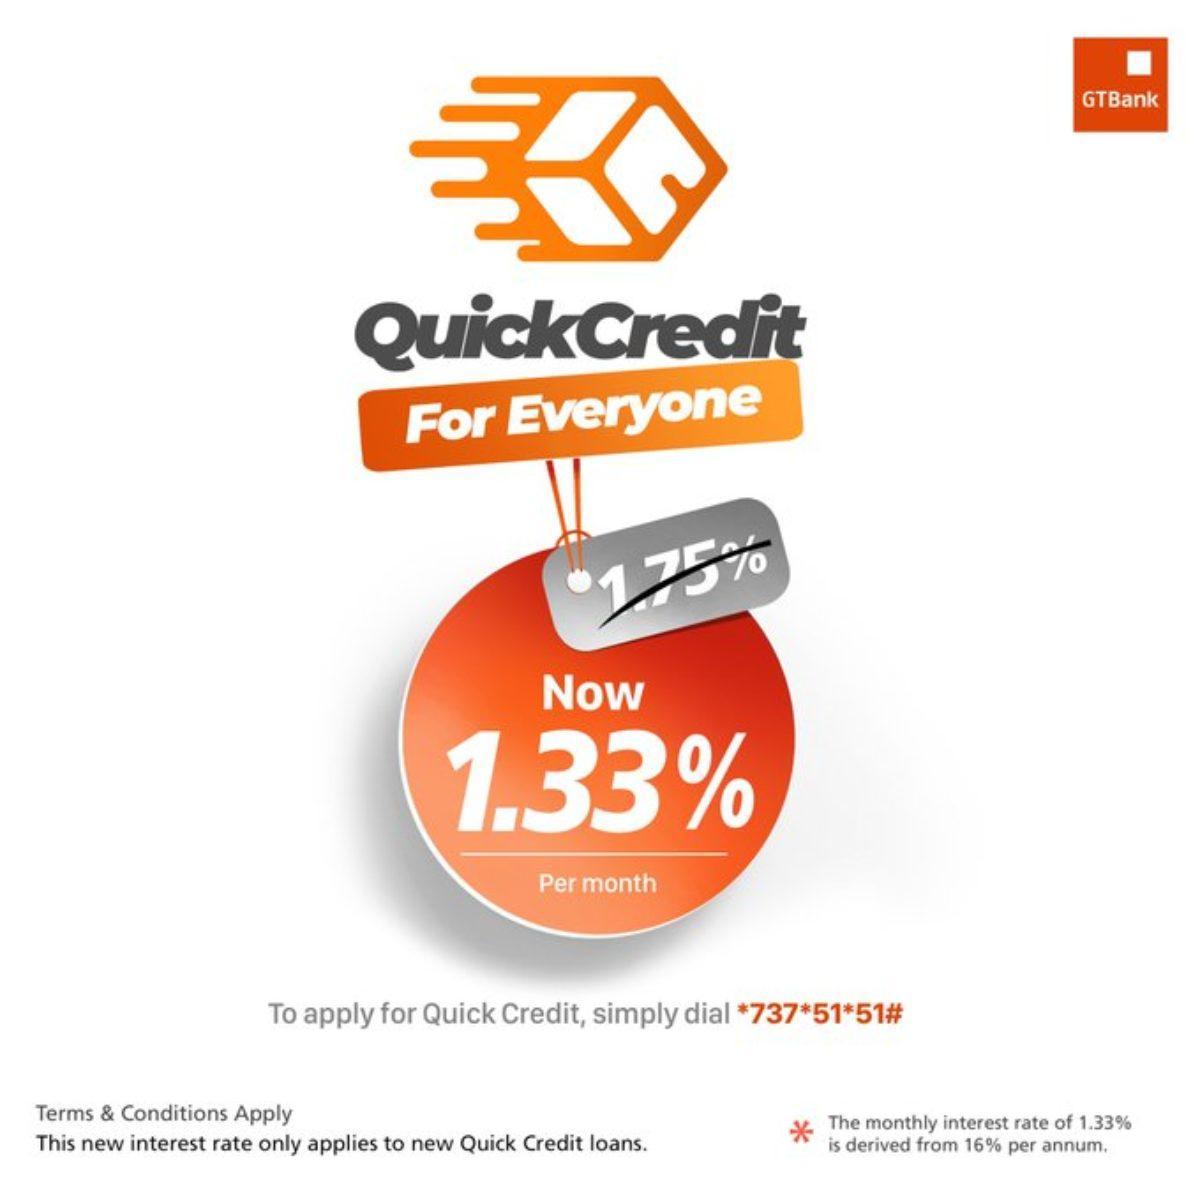 Gtbank QuickCredit